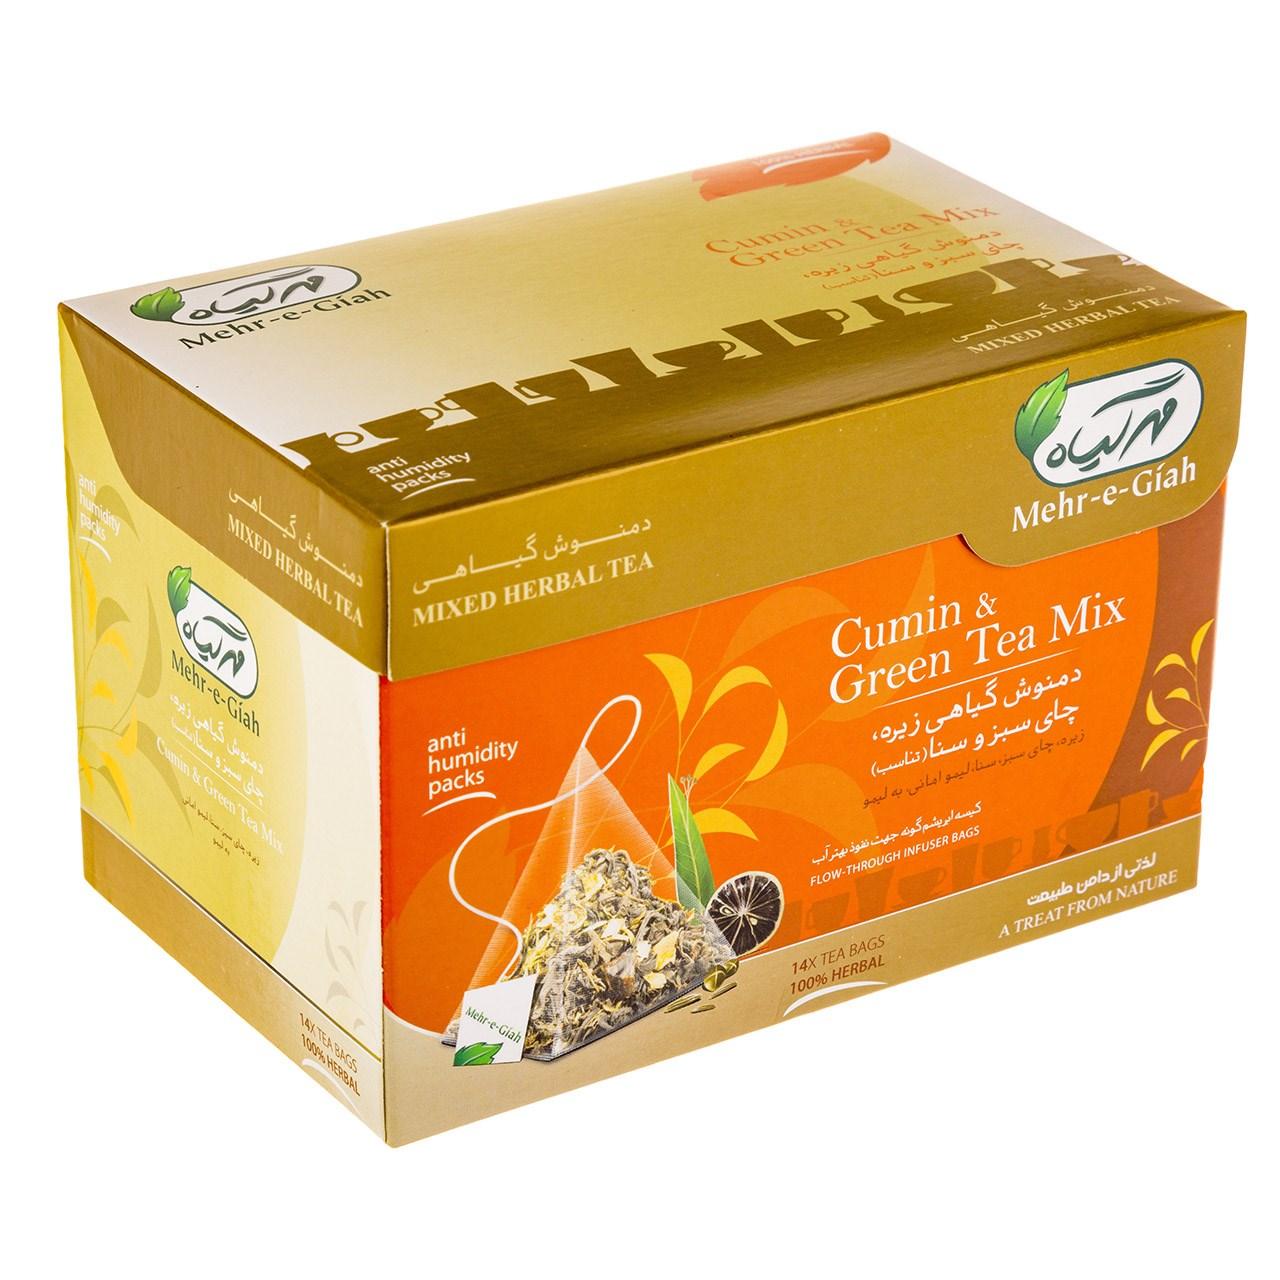 دمنوش گیاهی زیره چای سبز و سنا مهرگیاه بسته 14 عددی